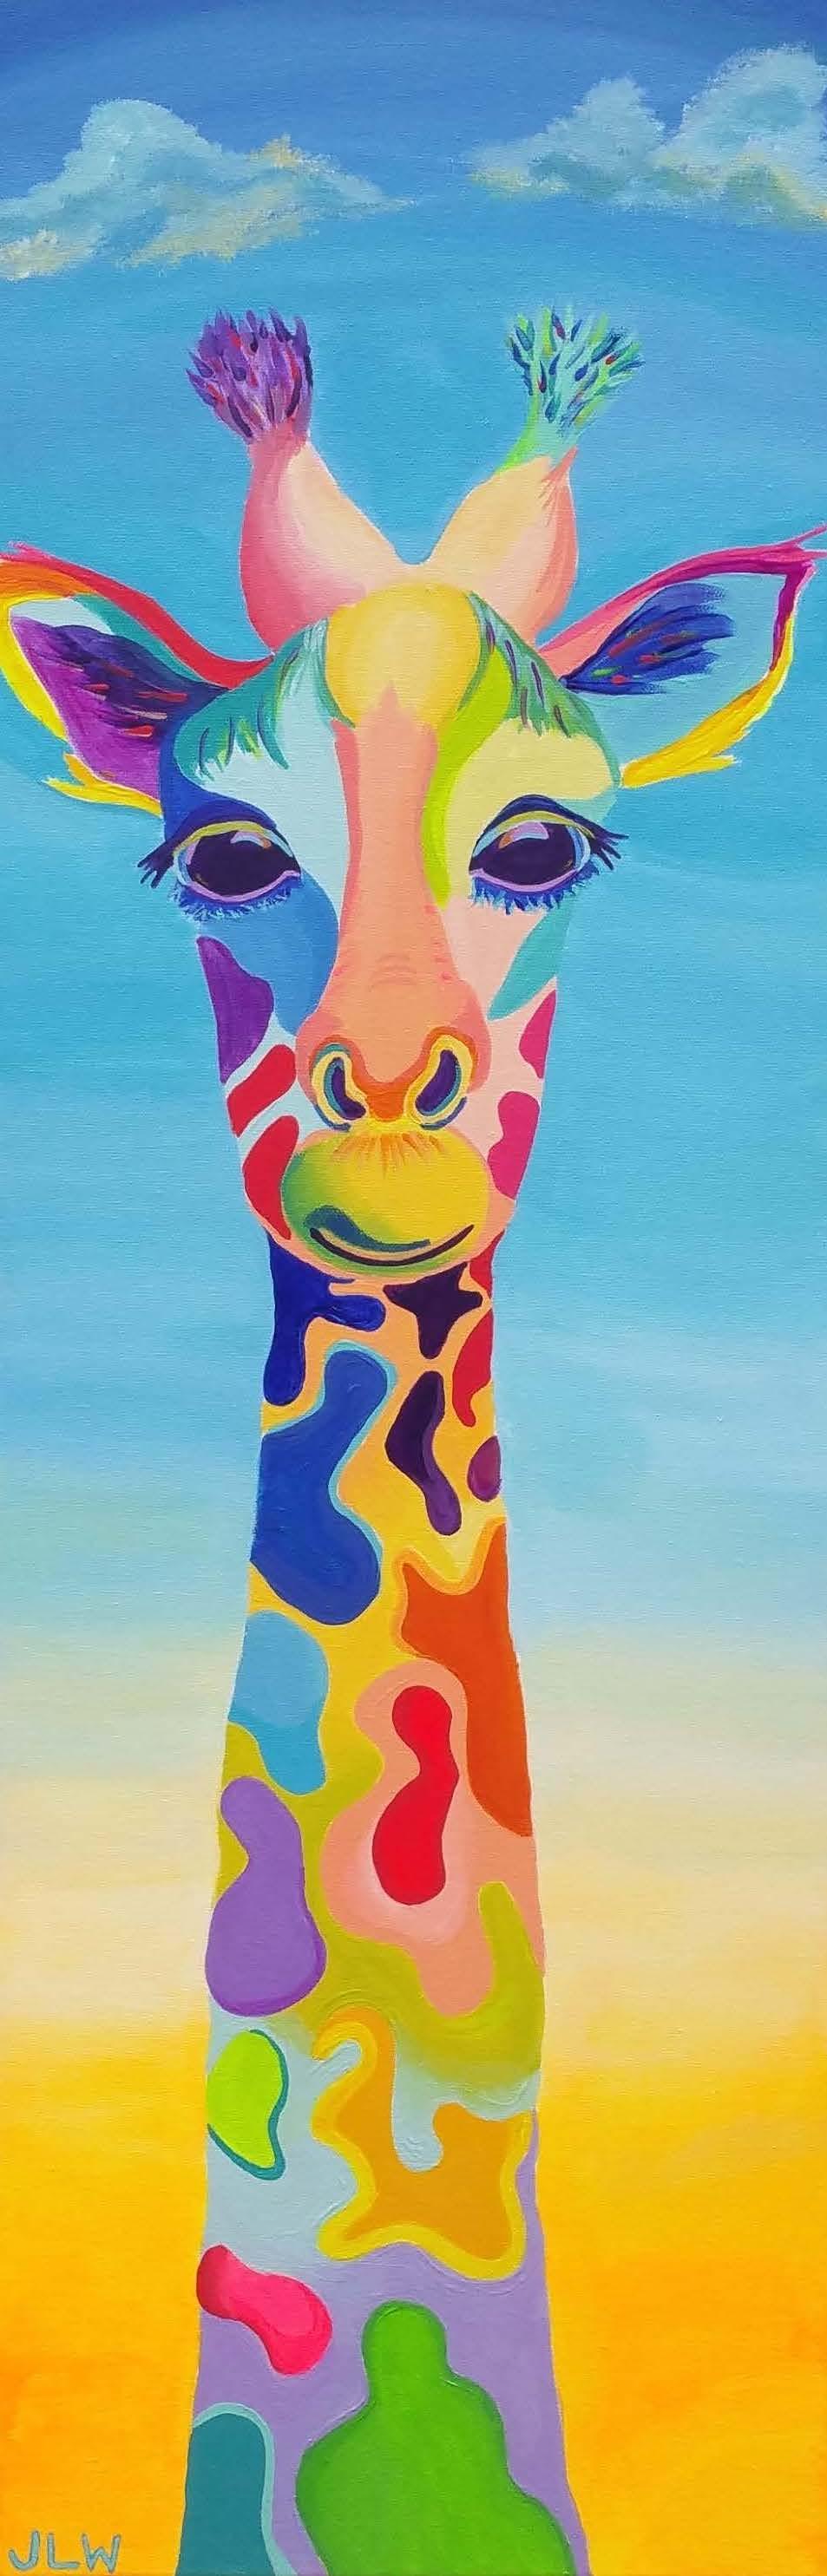 giffy giraffe.jpg